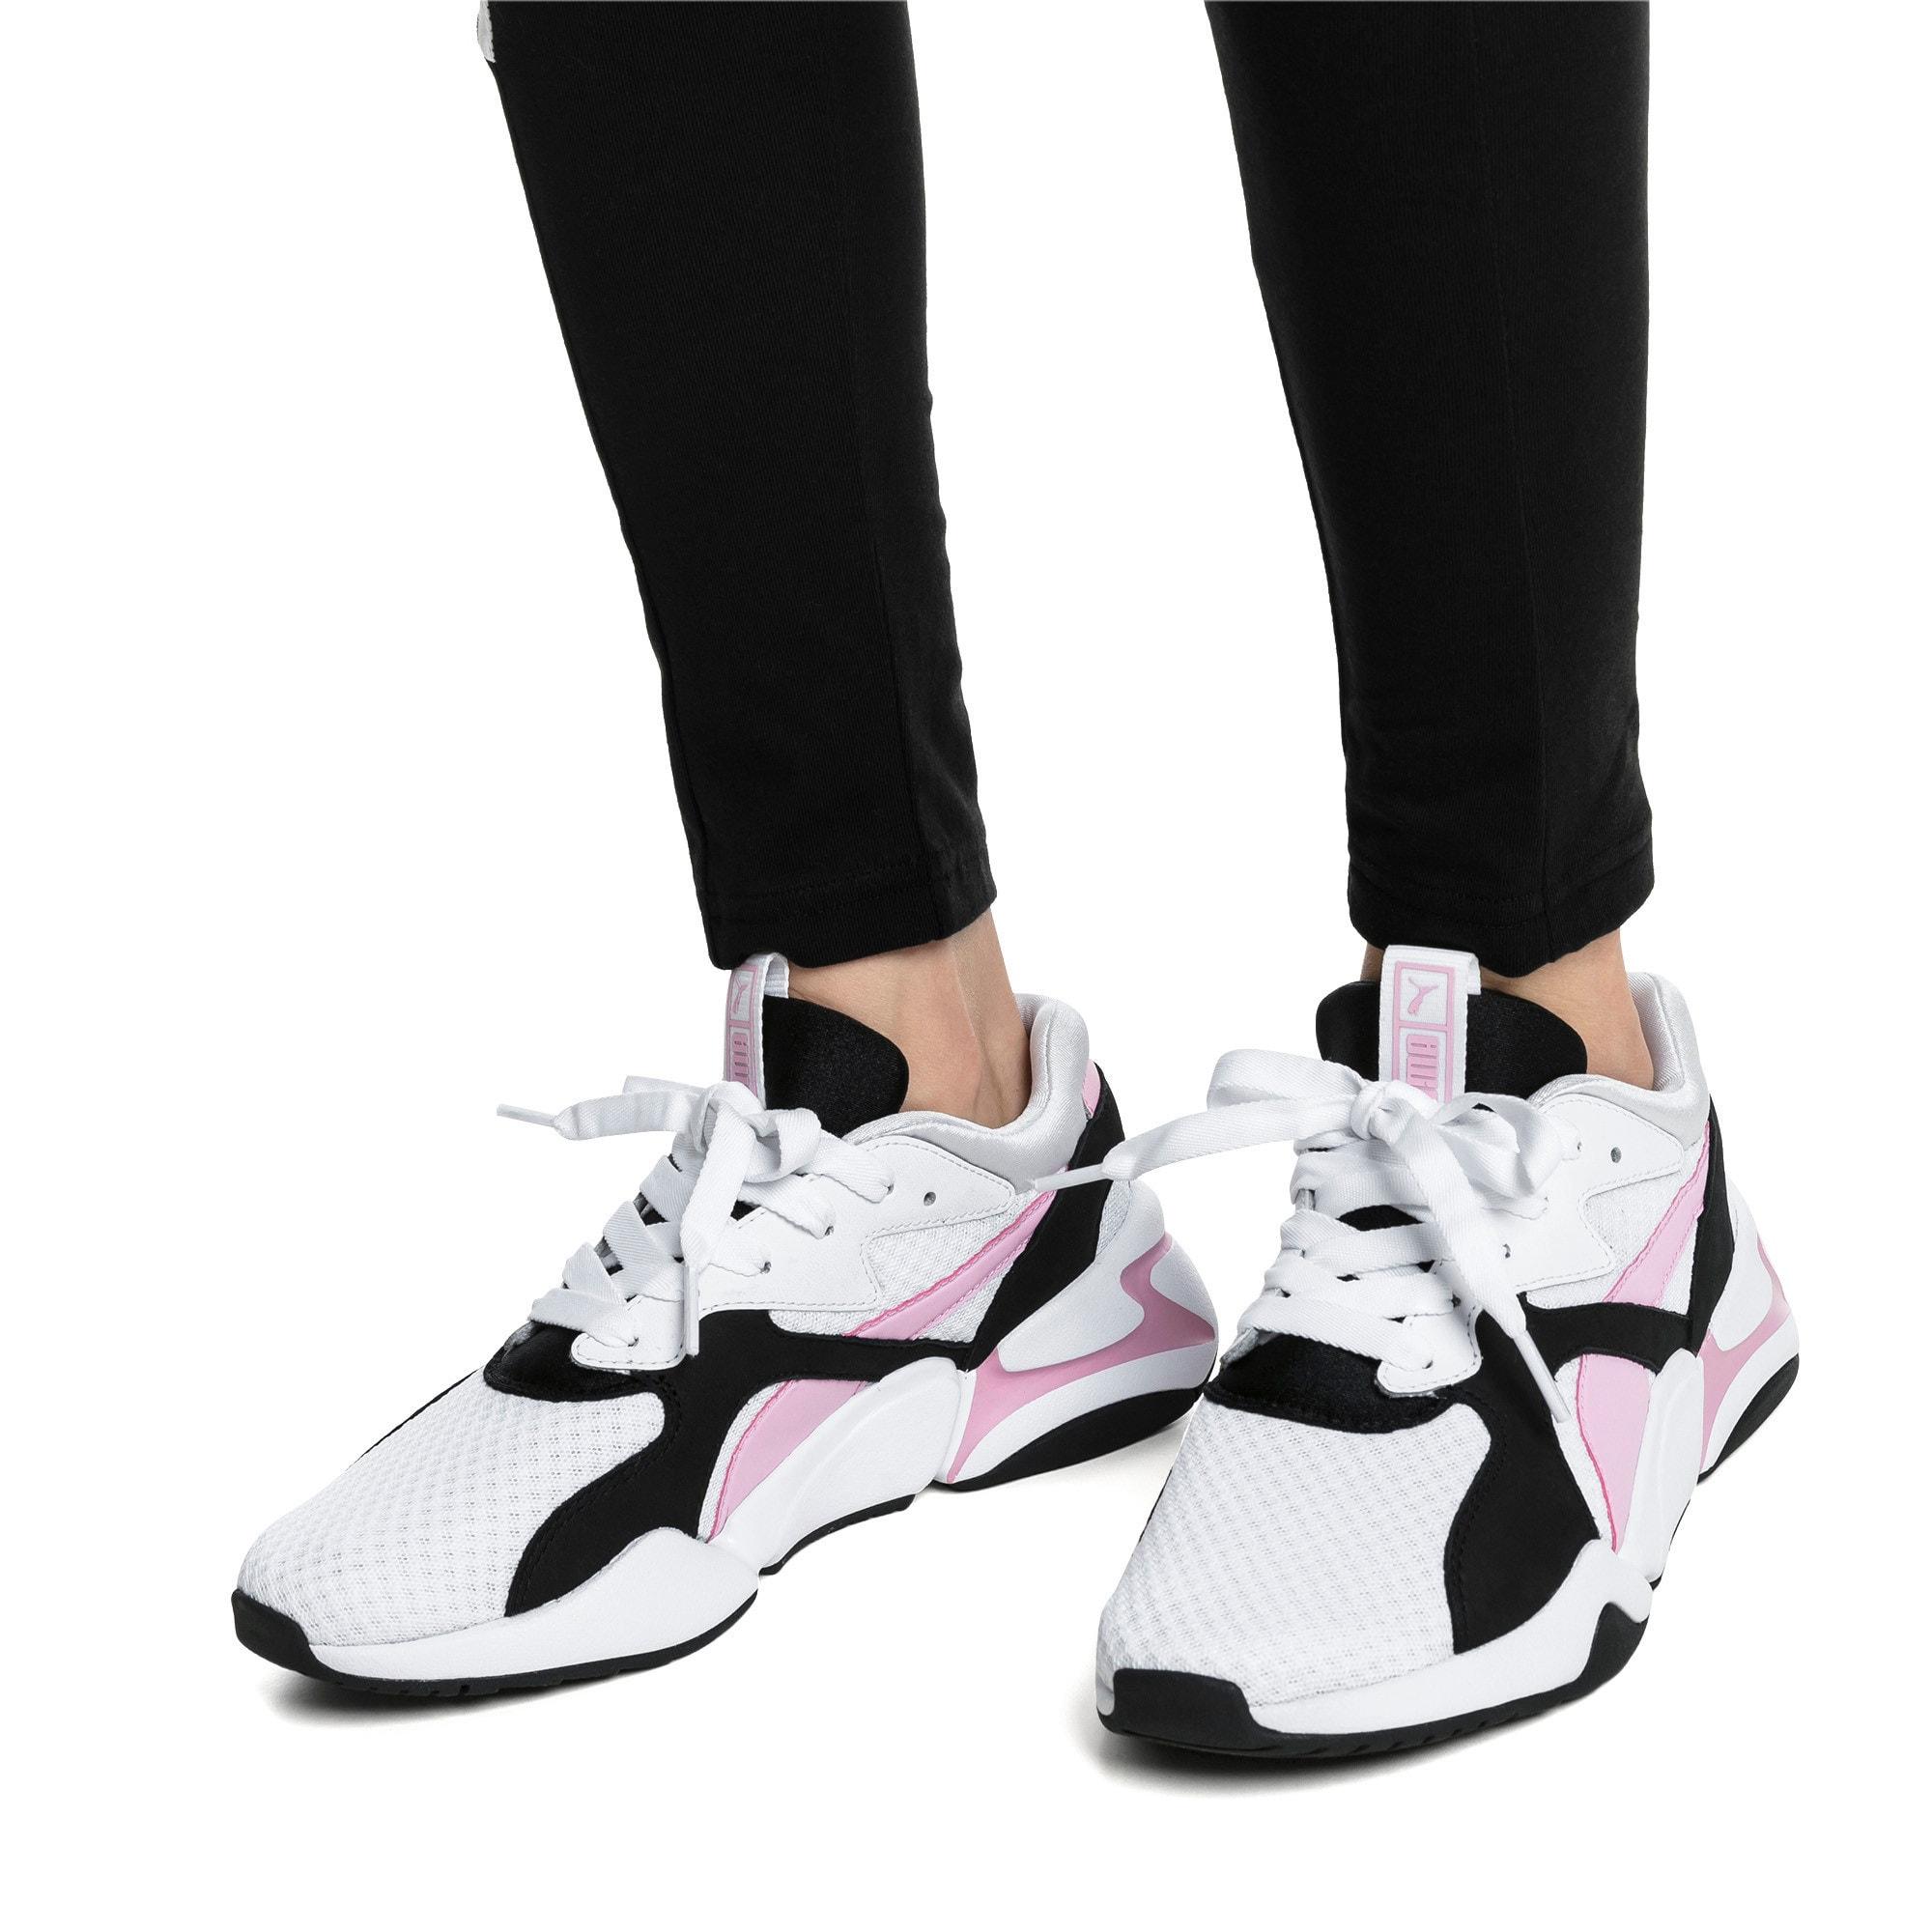 Thumbnail 2 of Nova '90s Bloc Women's Sneakers, Puma White-Pale Pink, medium